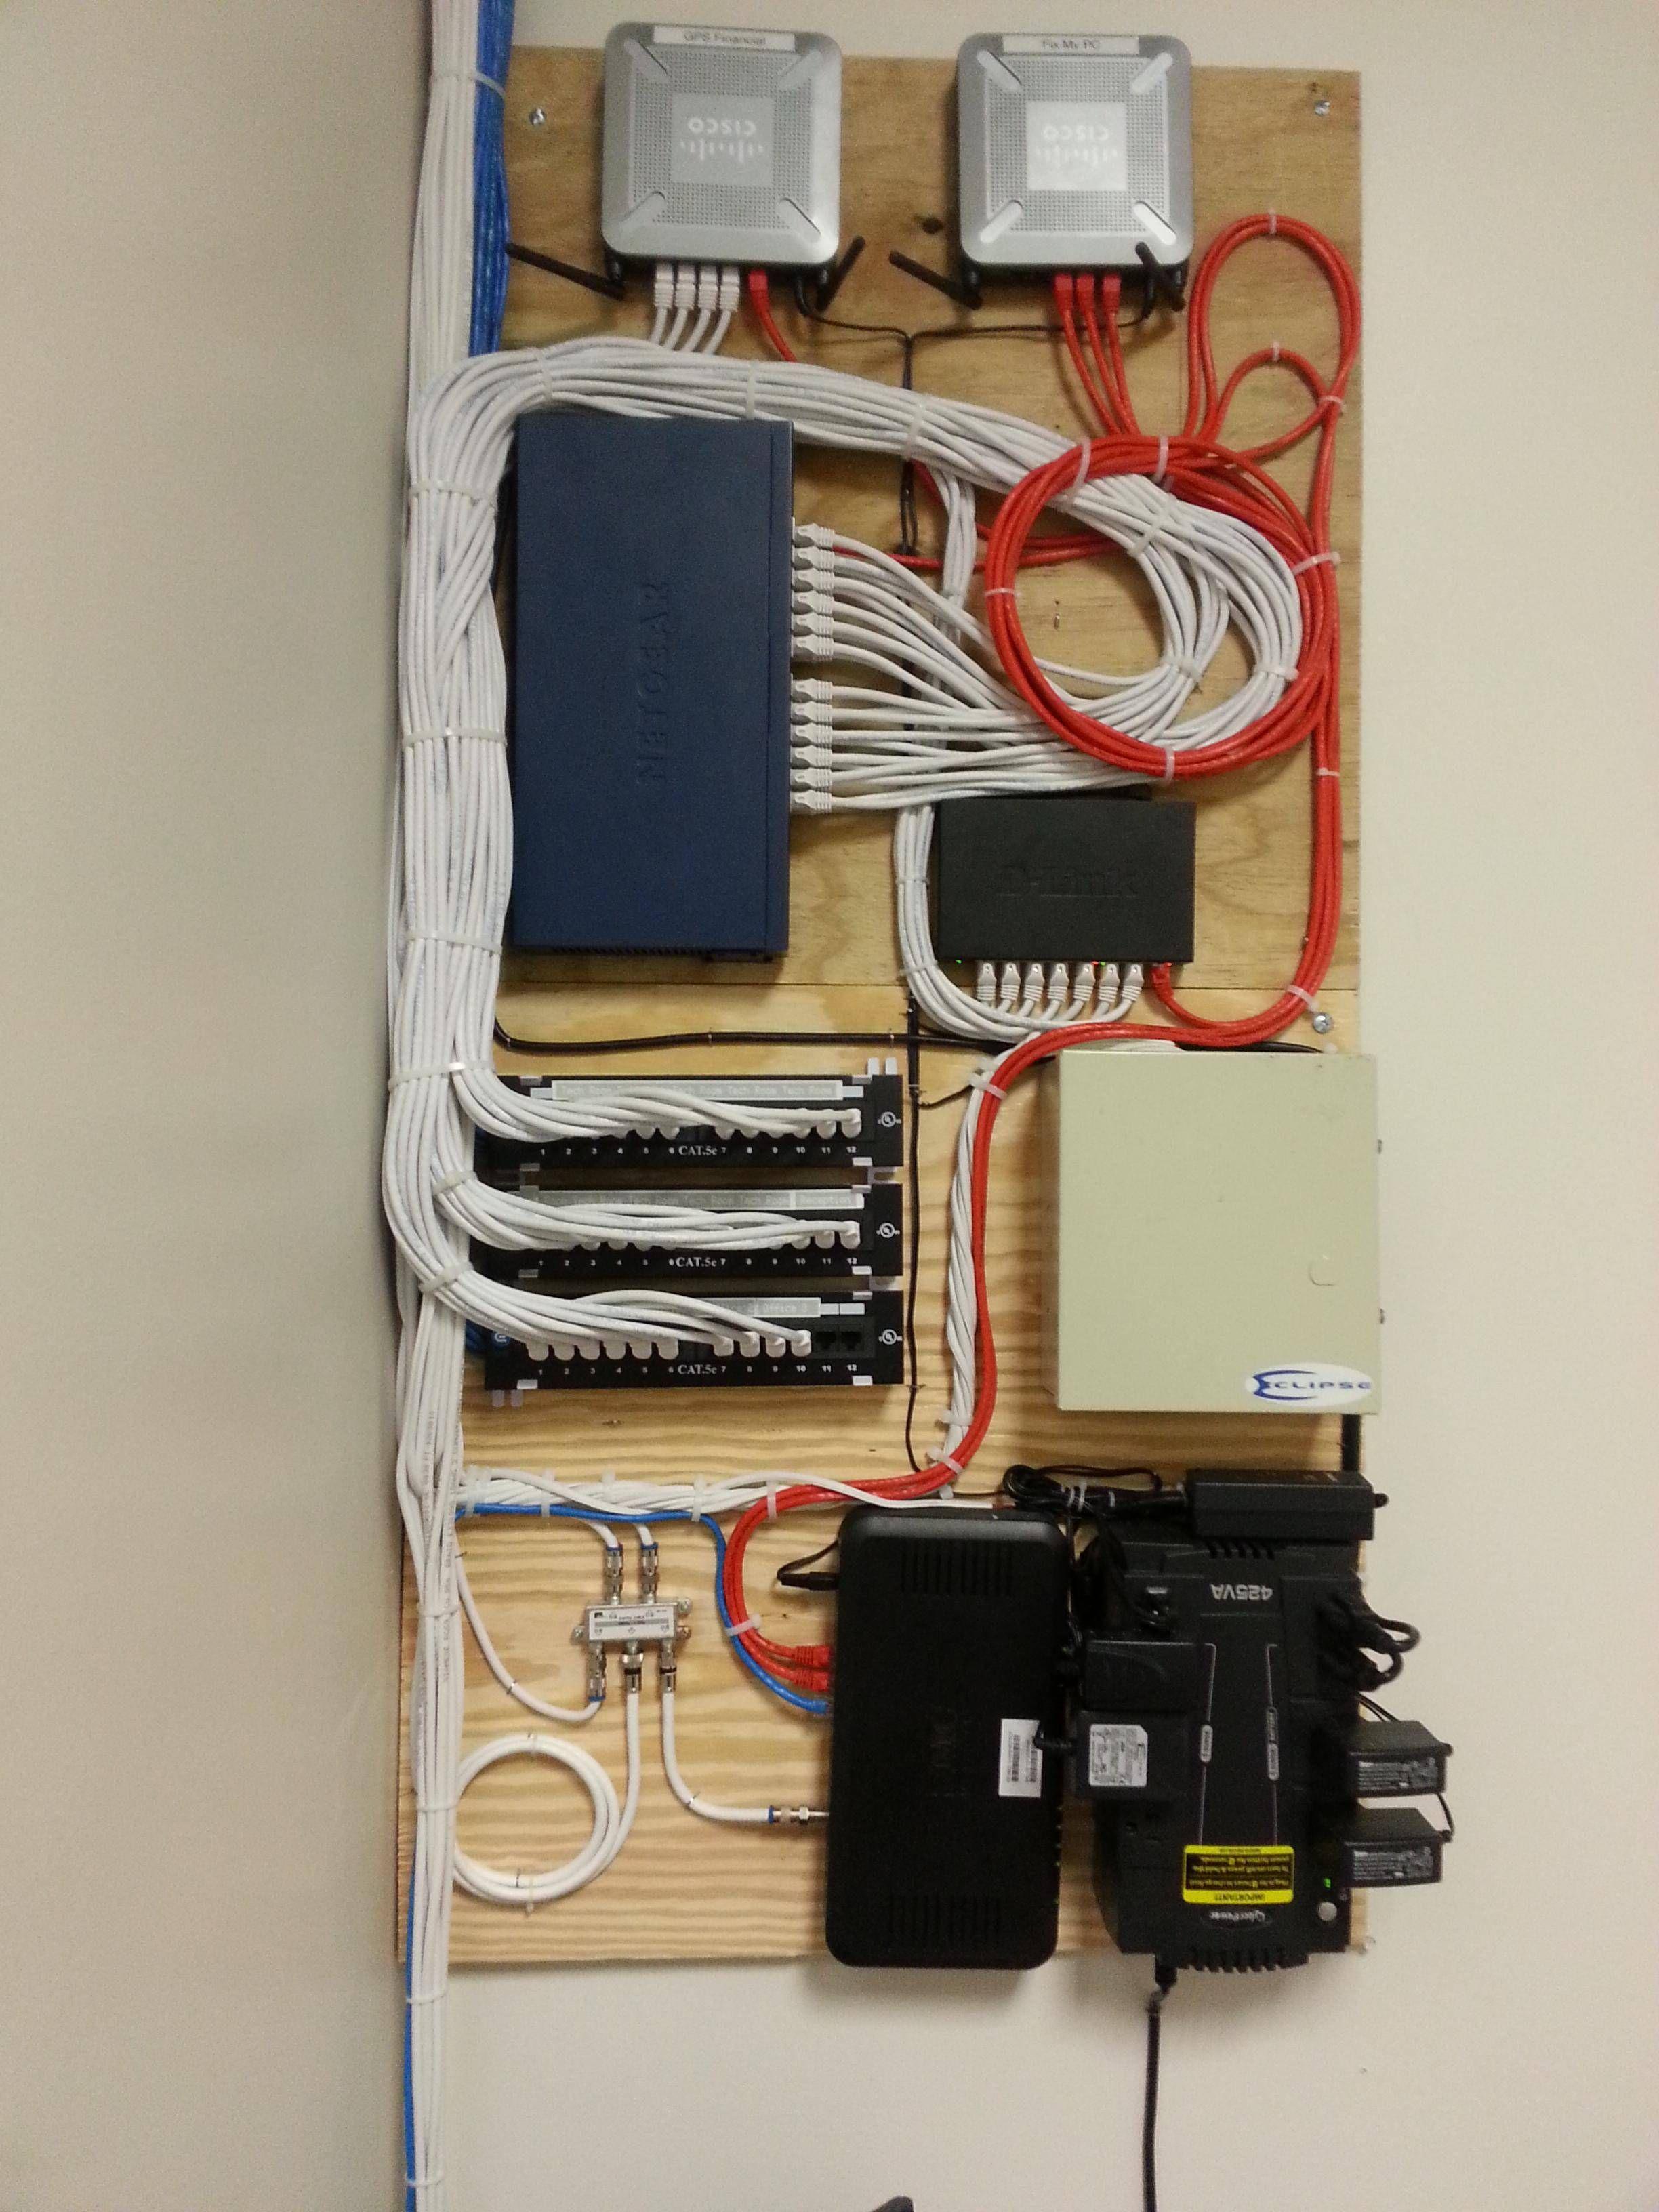 Cable management post cable management diy cable